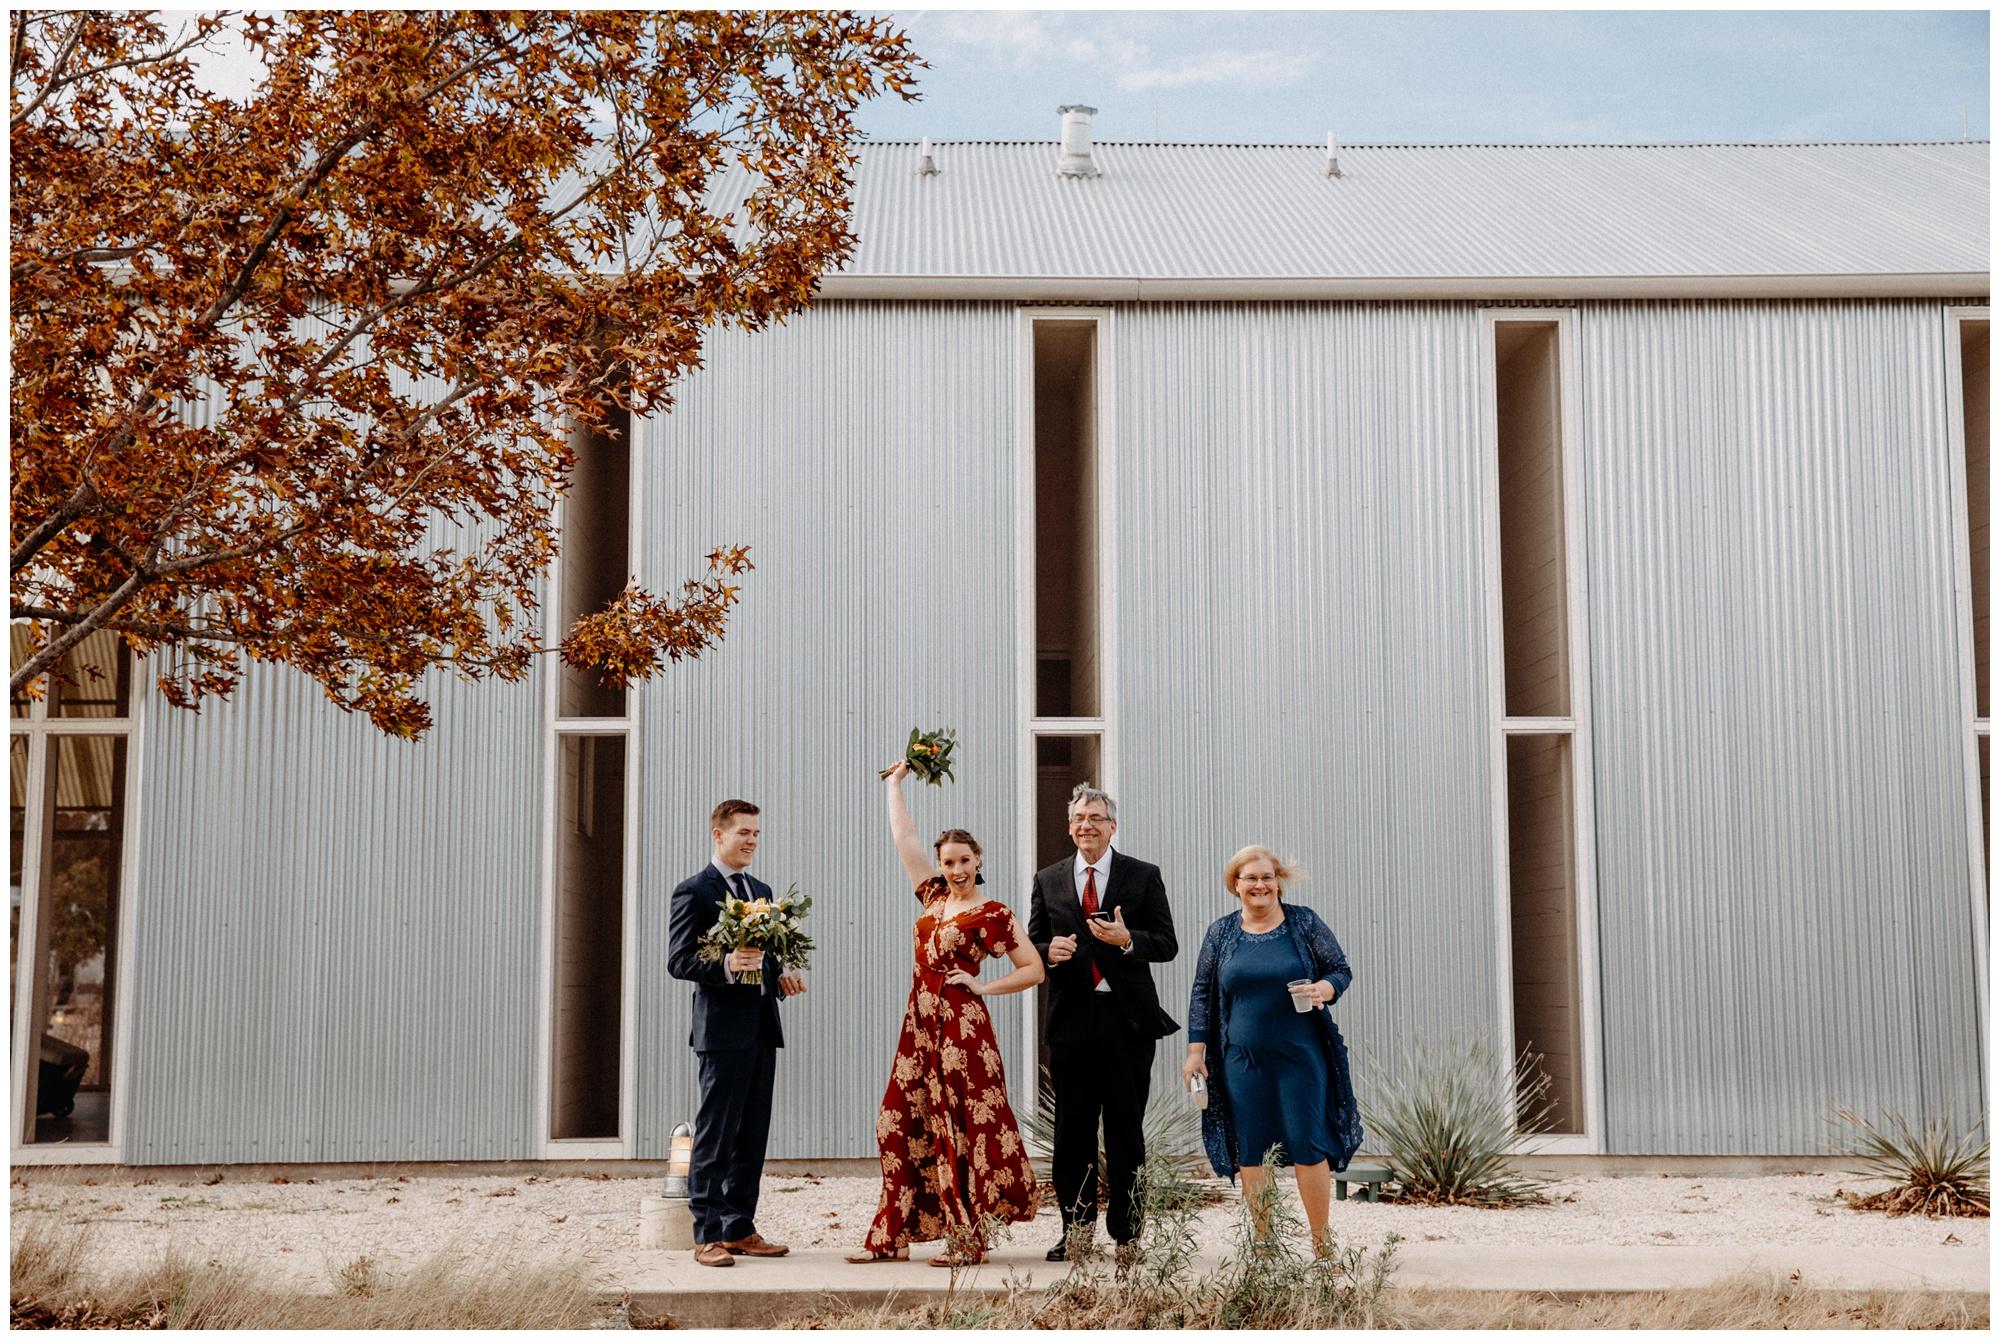 AUSTIN-TEXAS-PROSPECT-HOUSE-WEDDING-VENUE-PHOTOGRAPHY25762.JPG